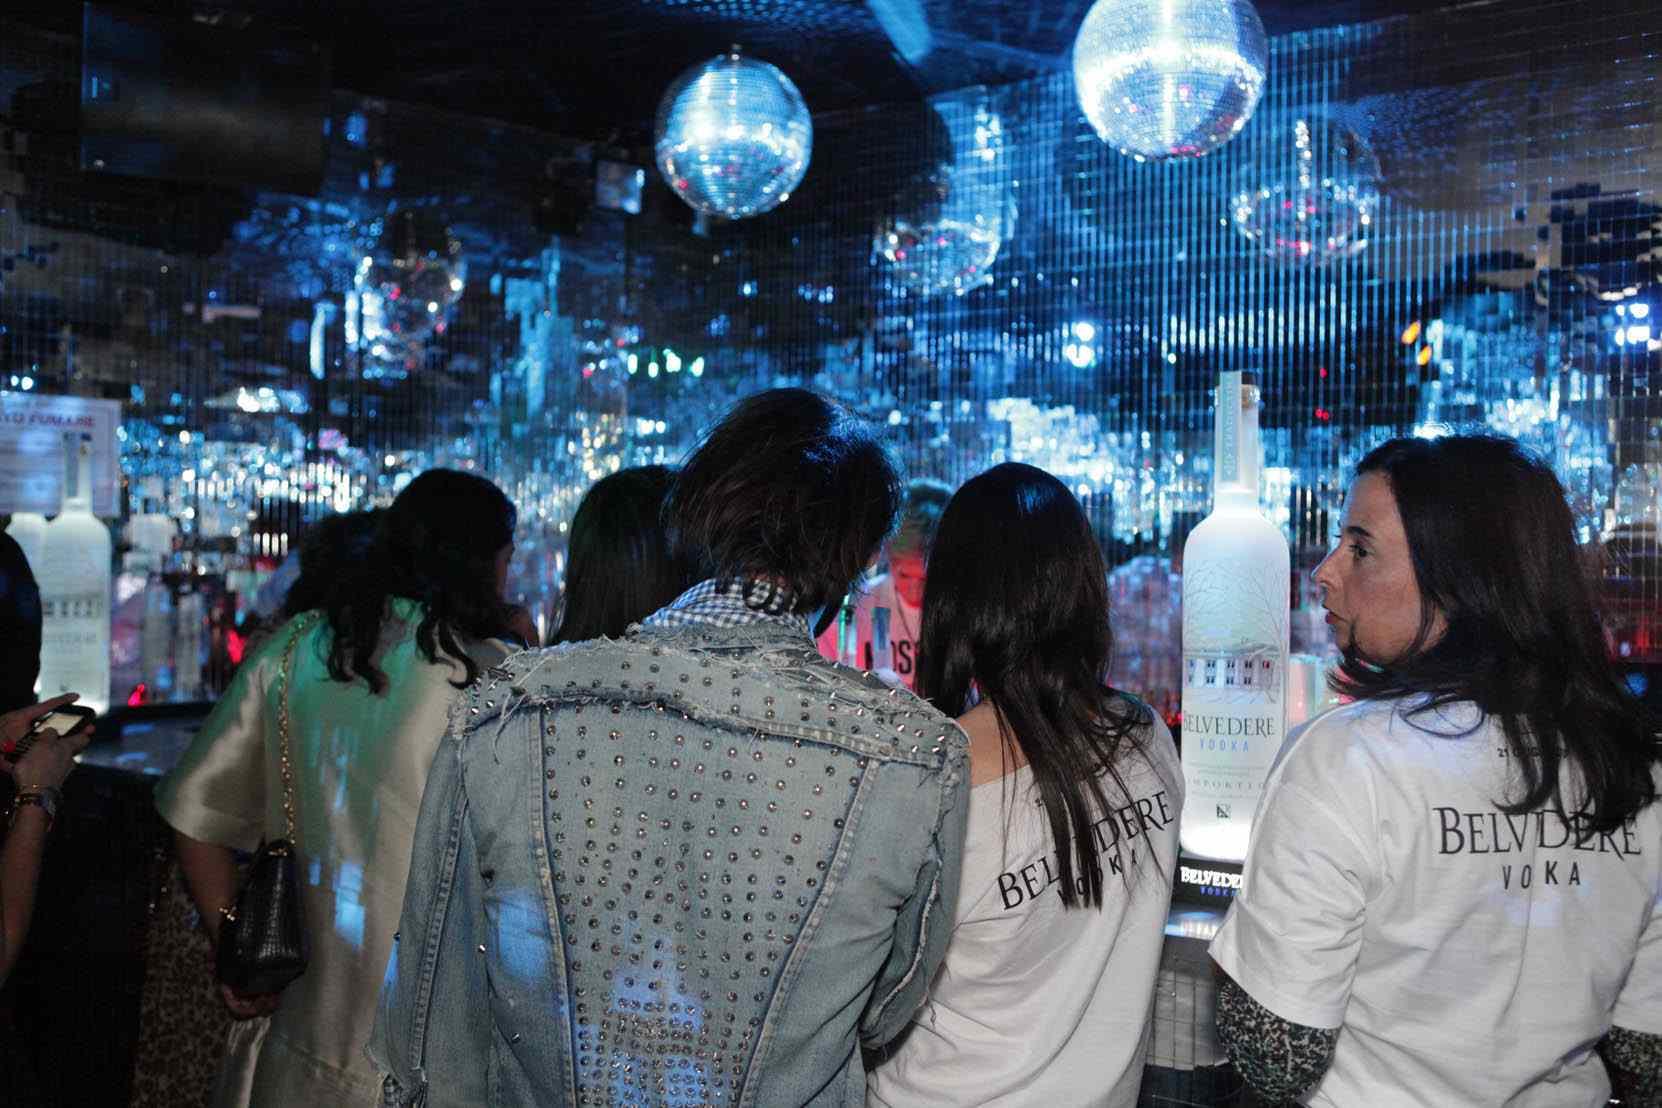 Moschino loves belvedere vodka party plastic milan modaonlive - Specchi riflessi karaoke ...